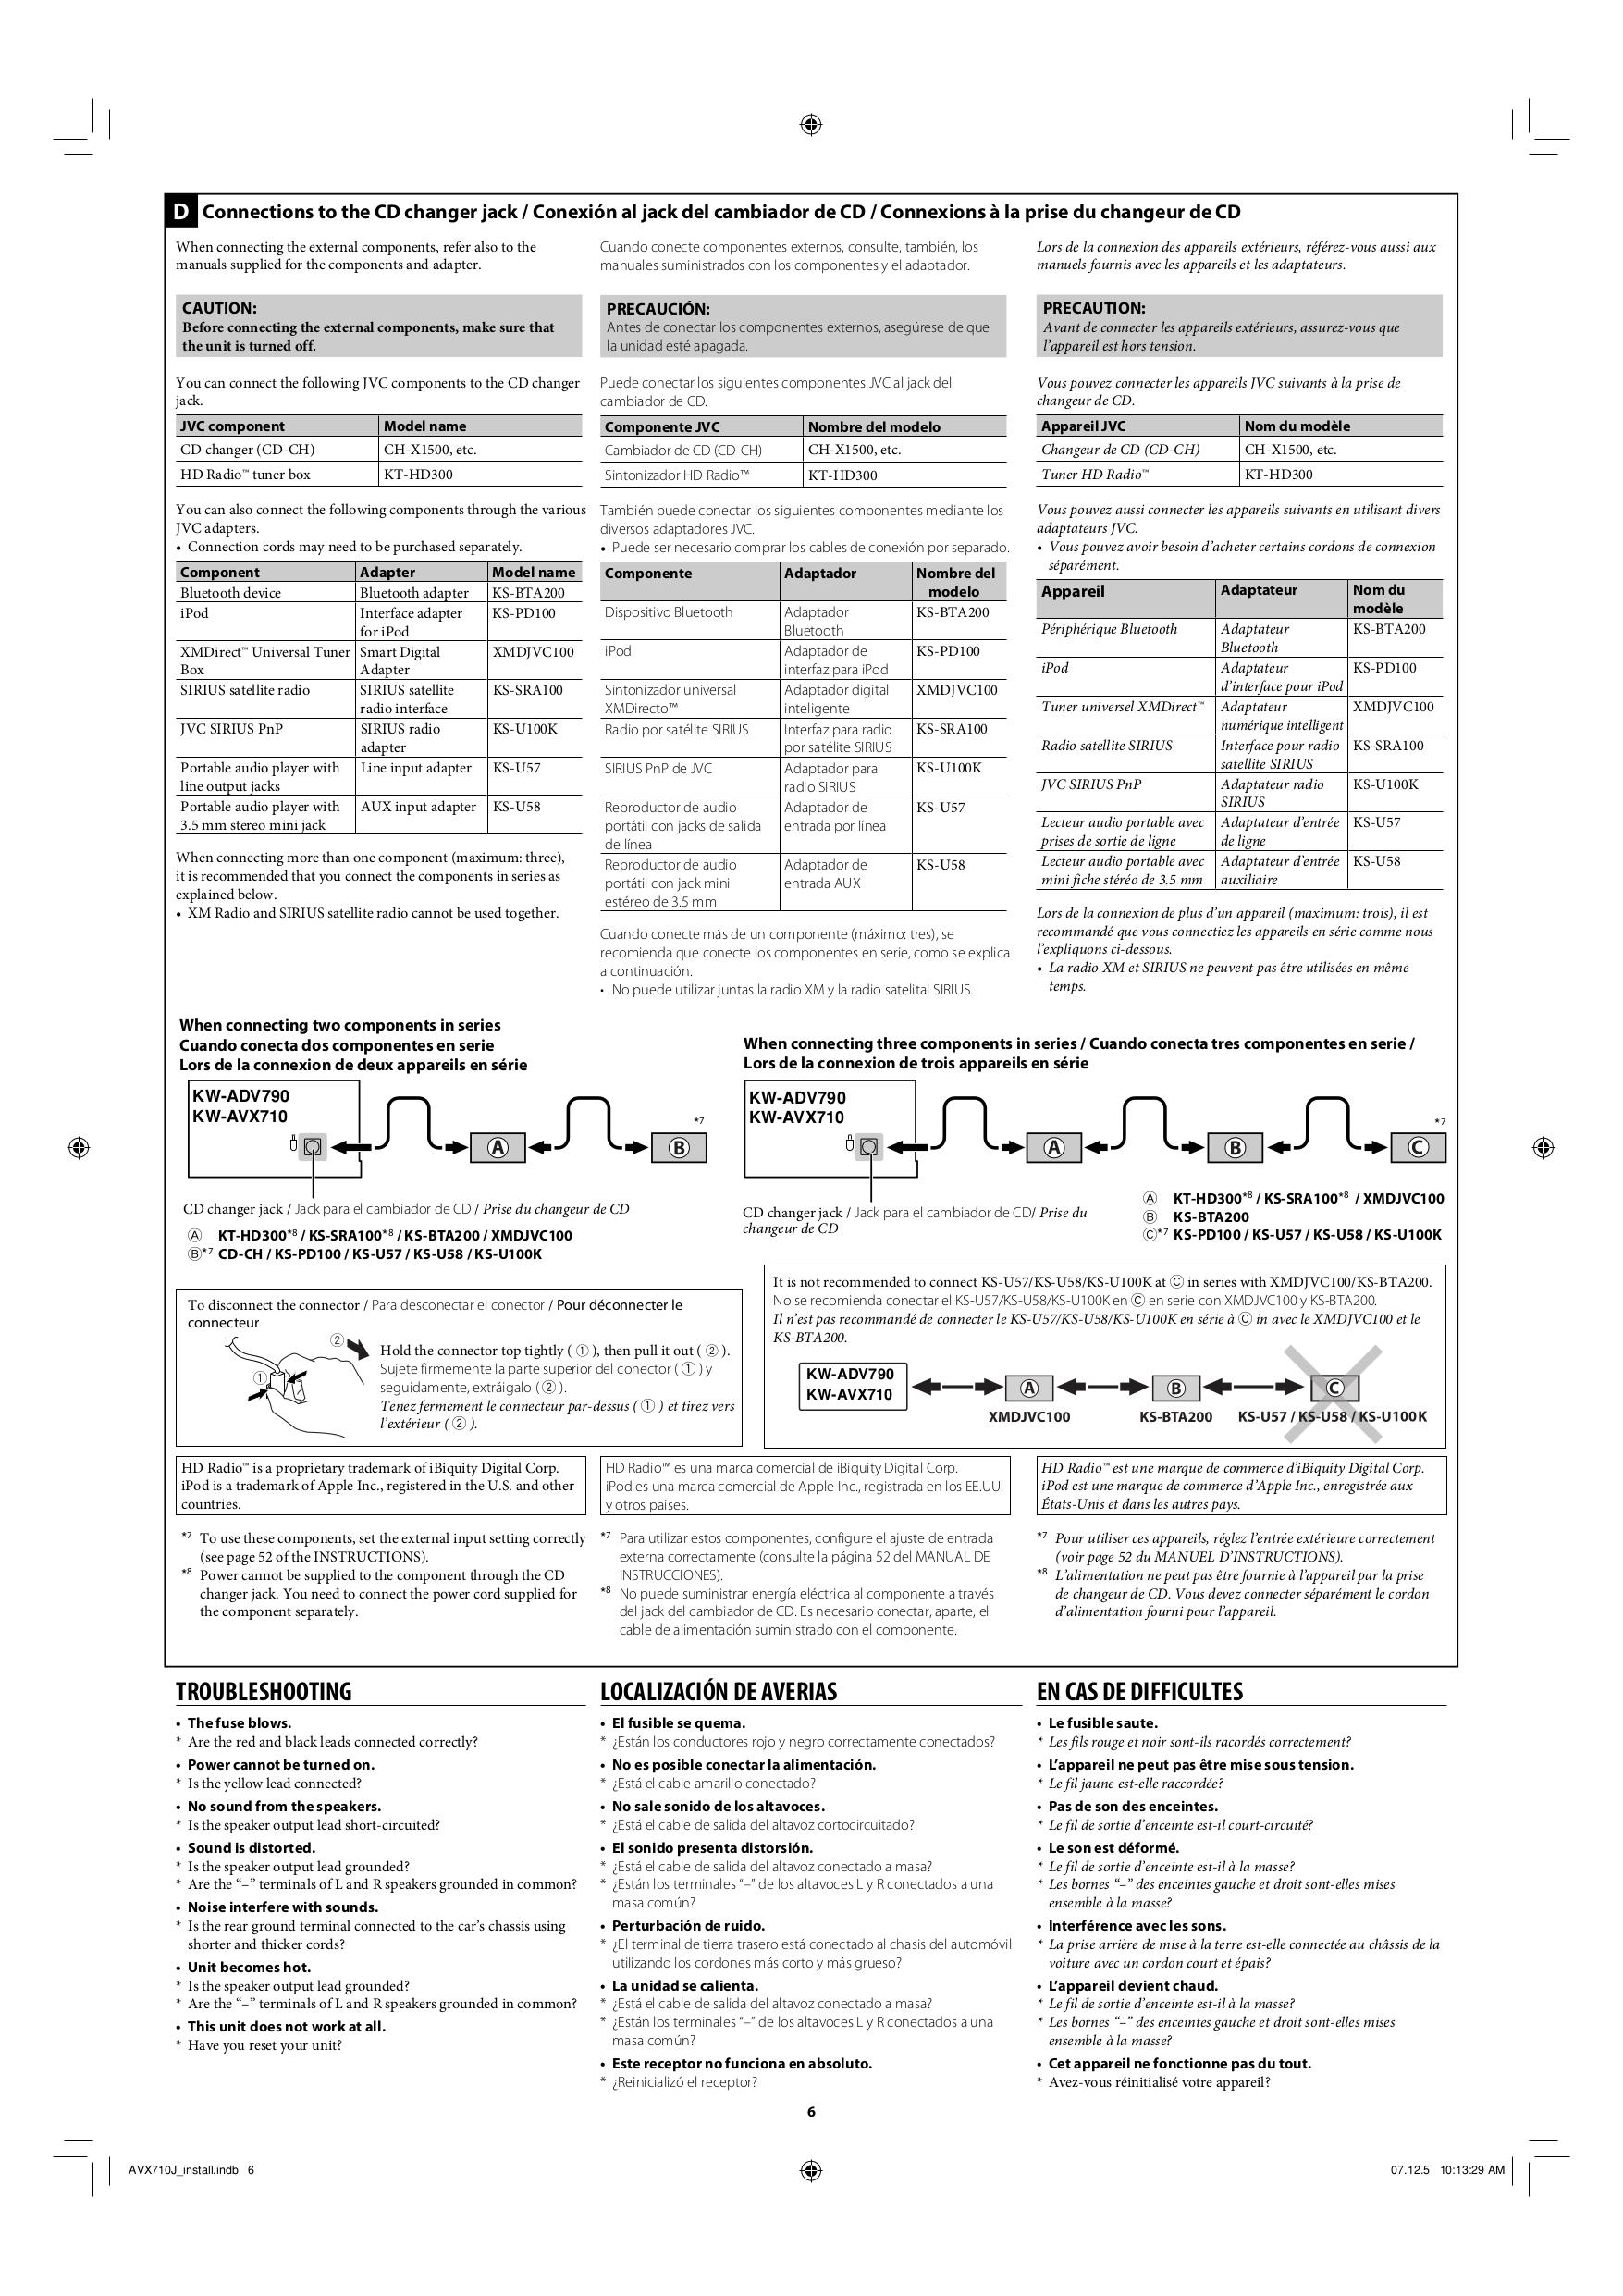 Kw Avx710 Wiring Diagram Free Download Diagrams Schematics Jvc Av60bt Maxwell Windlass Ez Pressure Switch Pdf Manual For Car Video Lvt1778 002a 611990